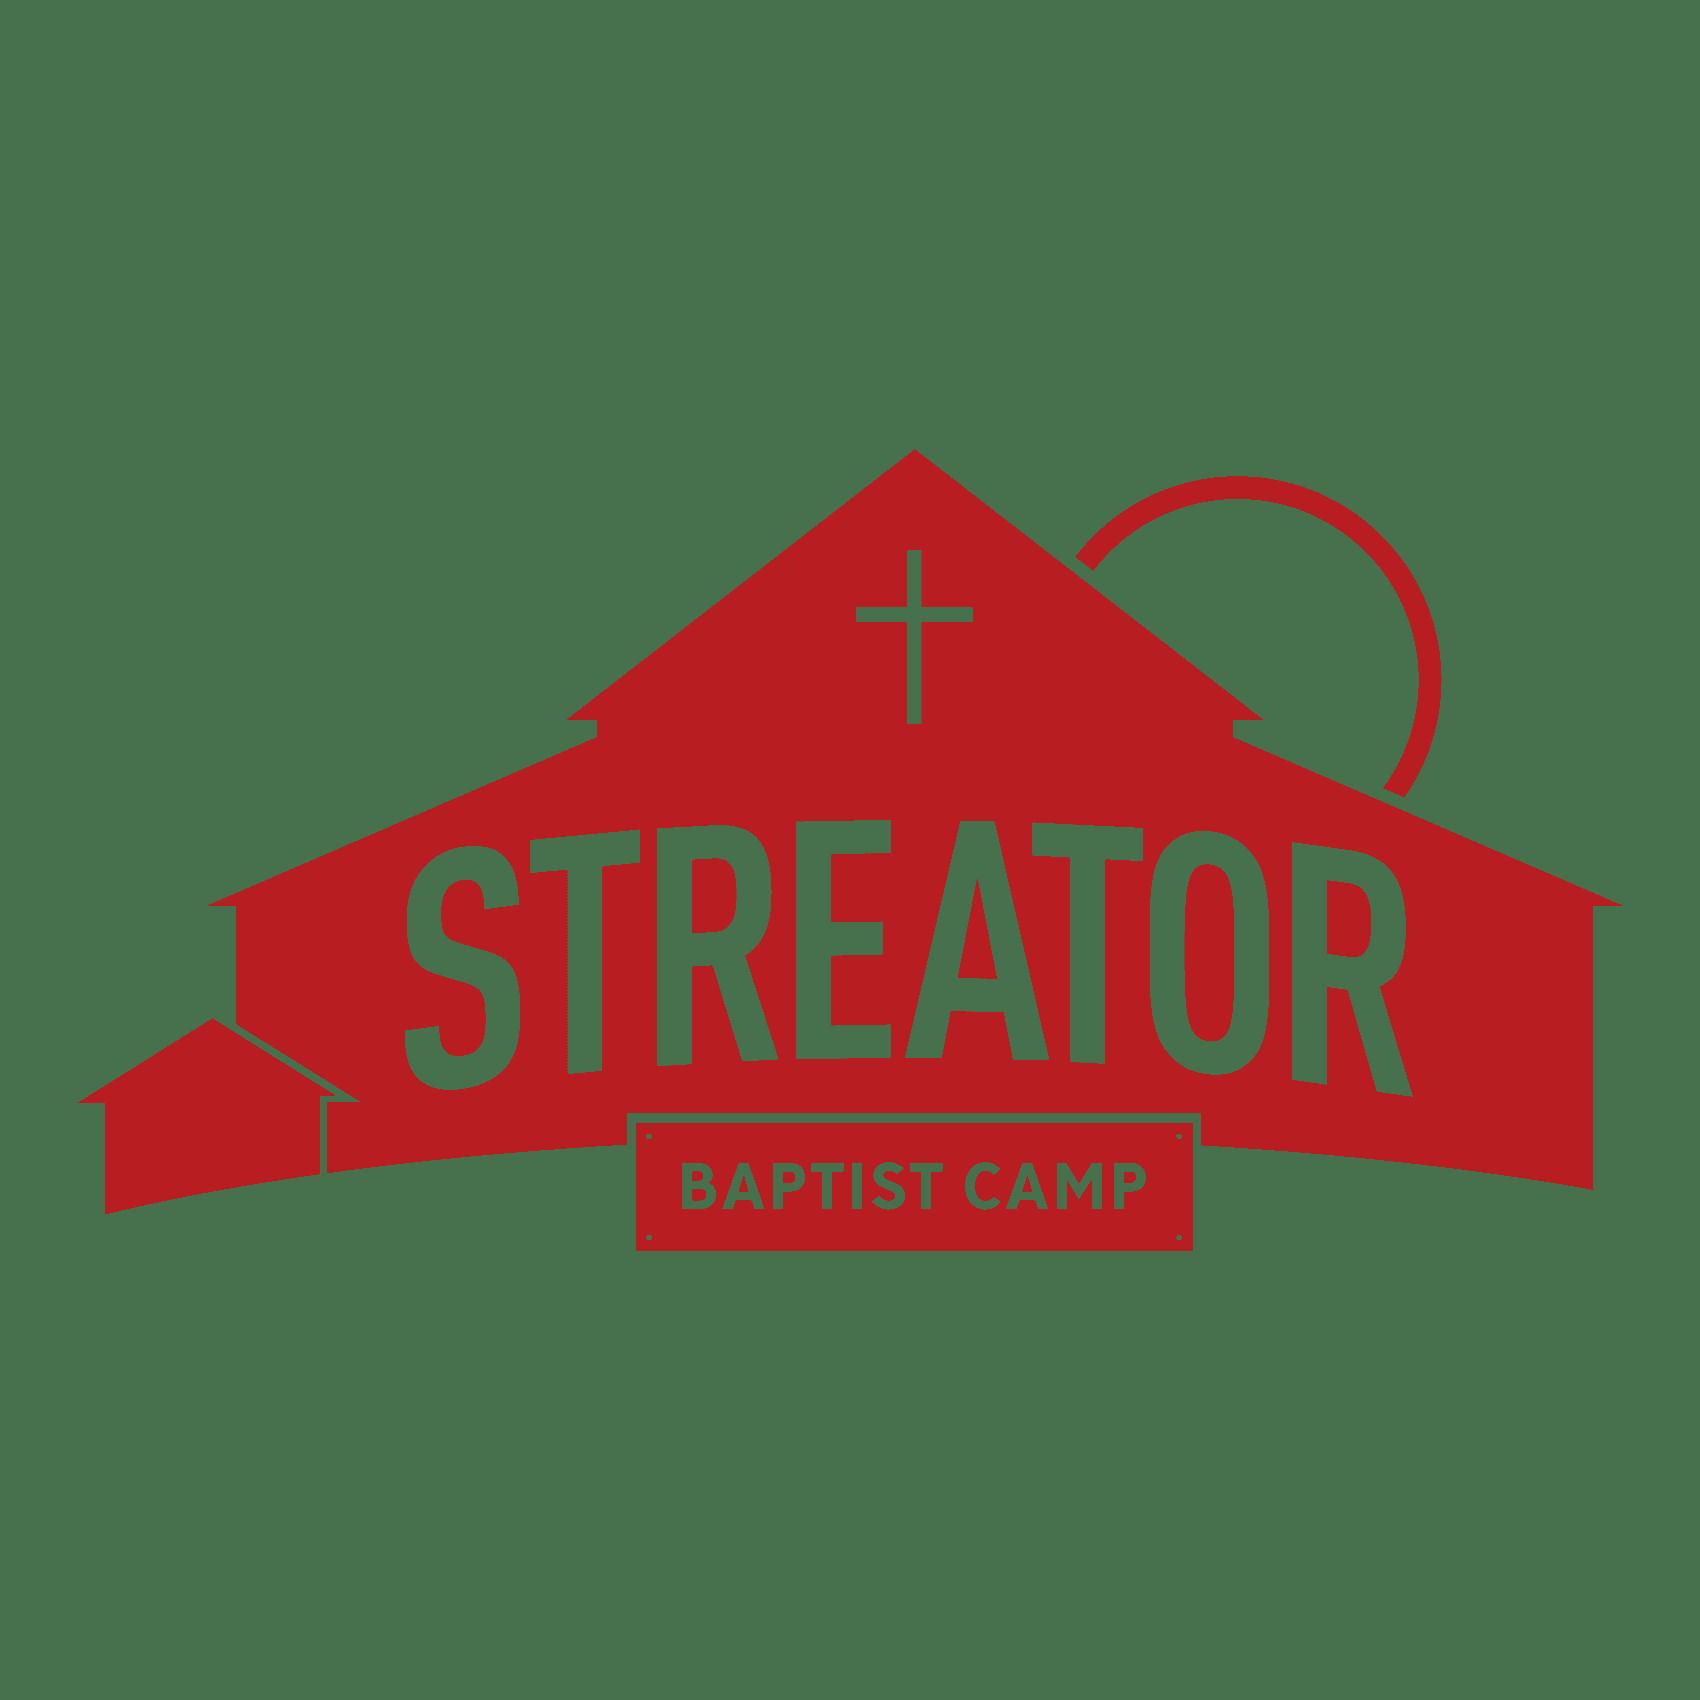 Streator logo